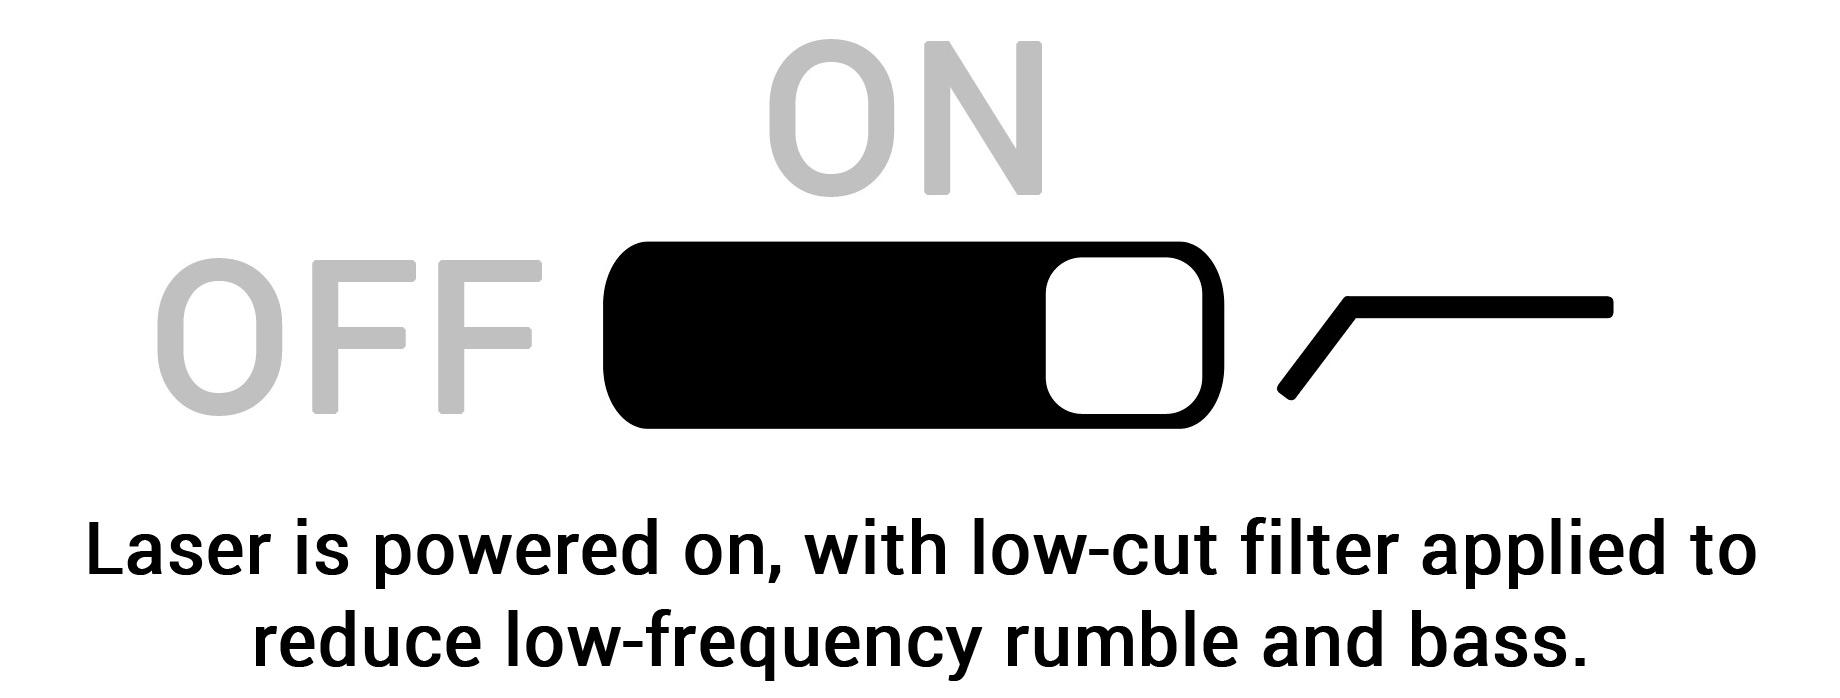 laser-switch-hp.jpg